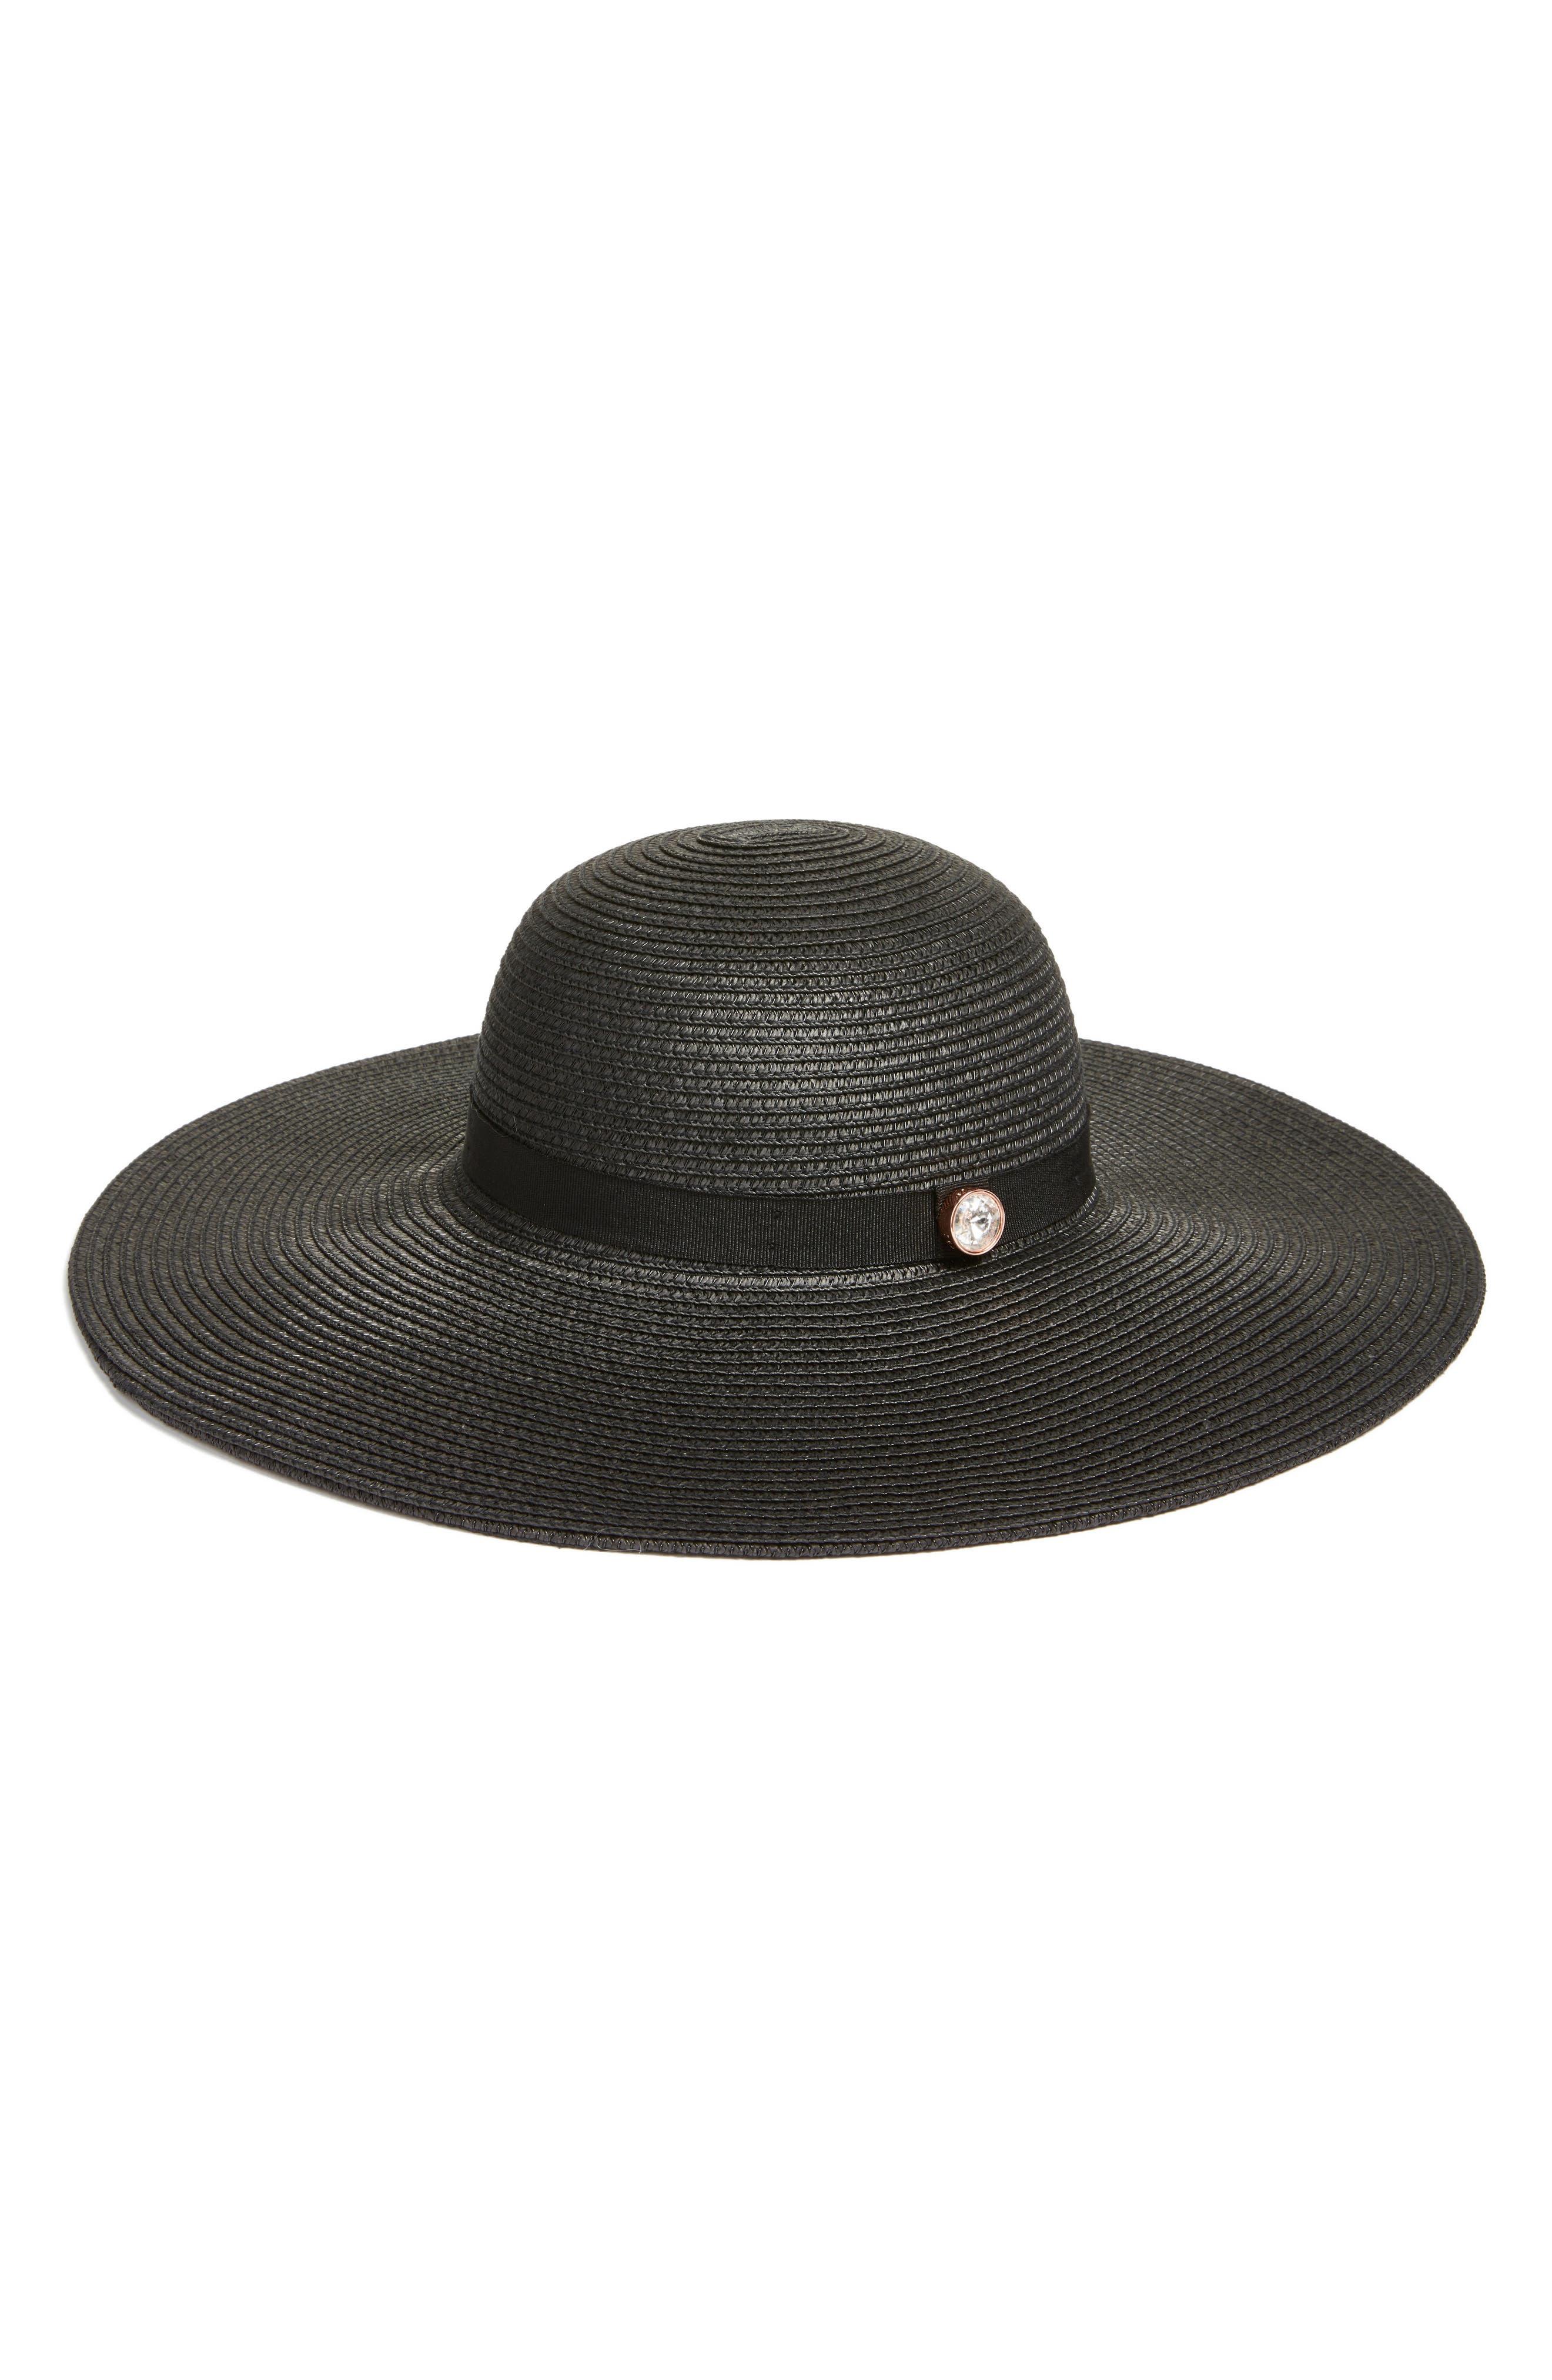 Theasa Straw Hat,                         Main,                         color, Black